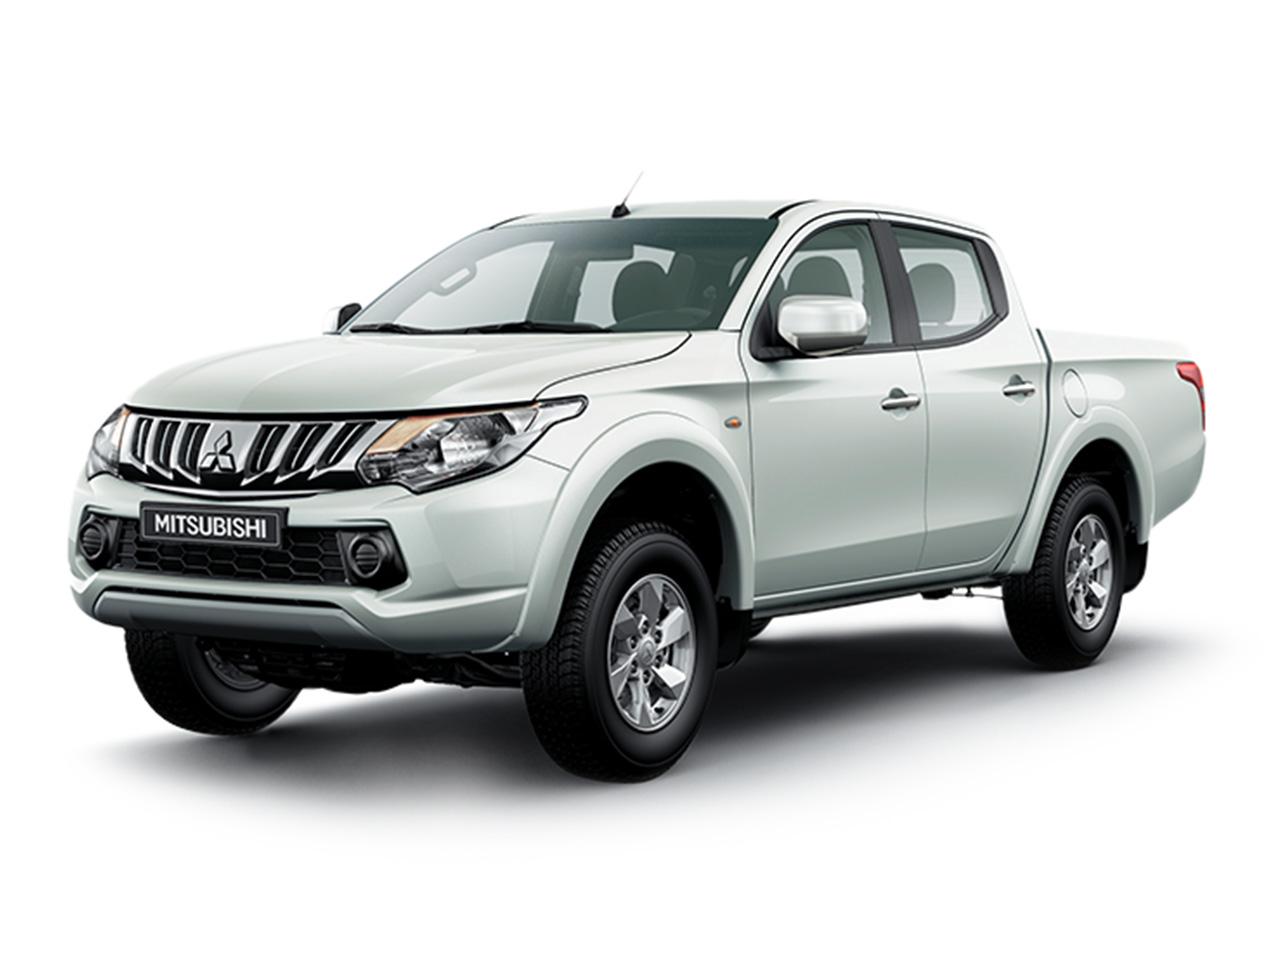 2017 Mitsubishi L200 Prices in UAE, Gulf Specs & Reviews ...